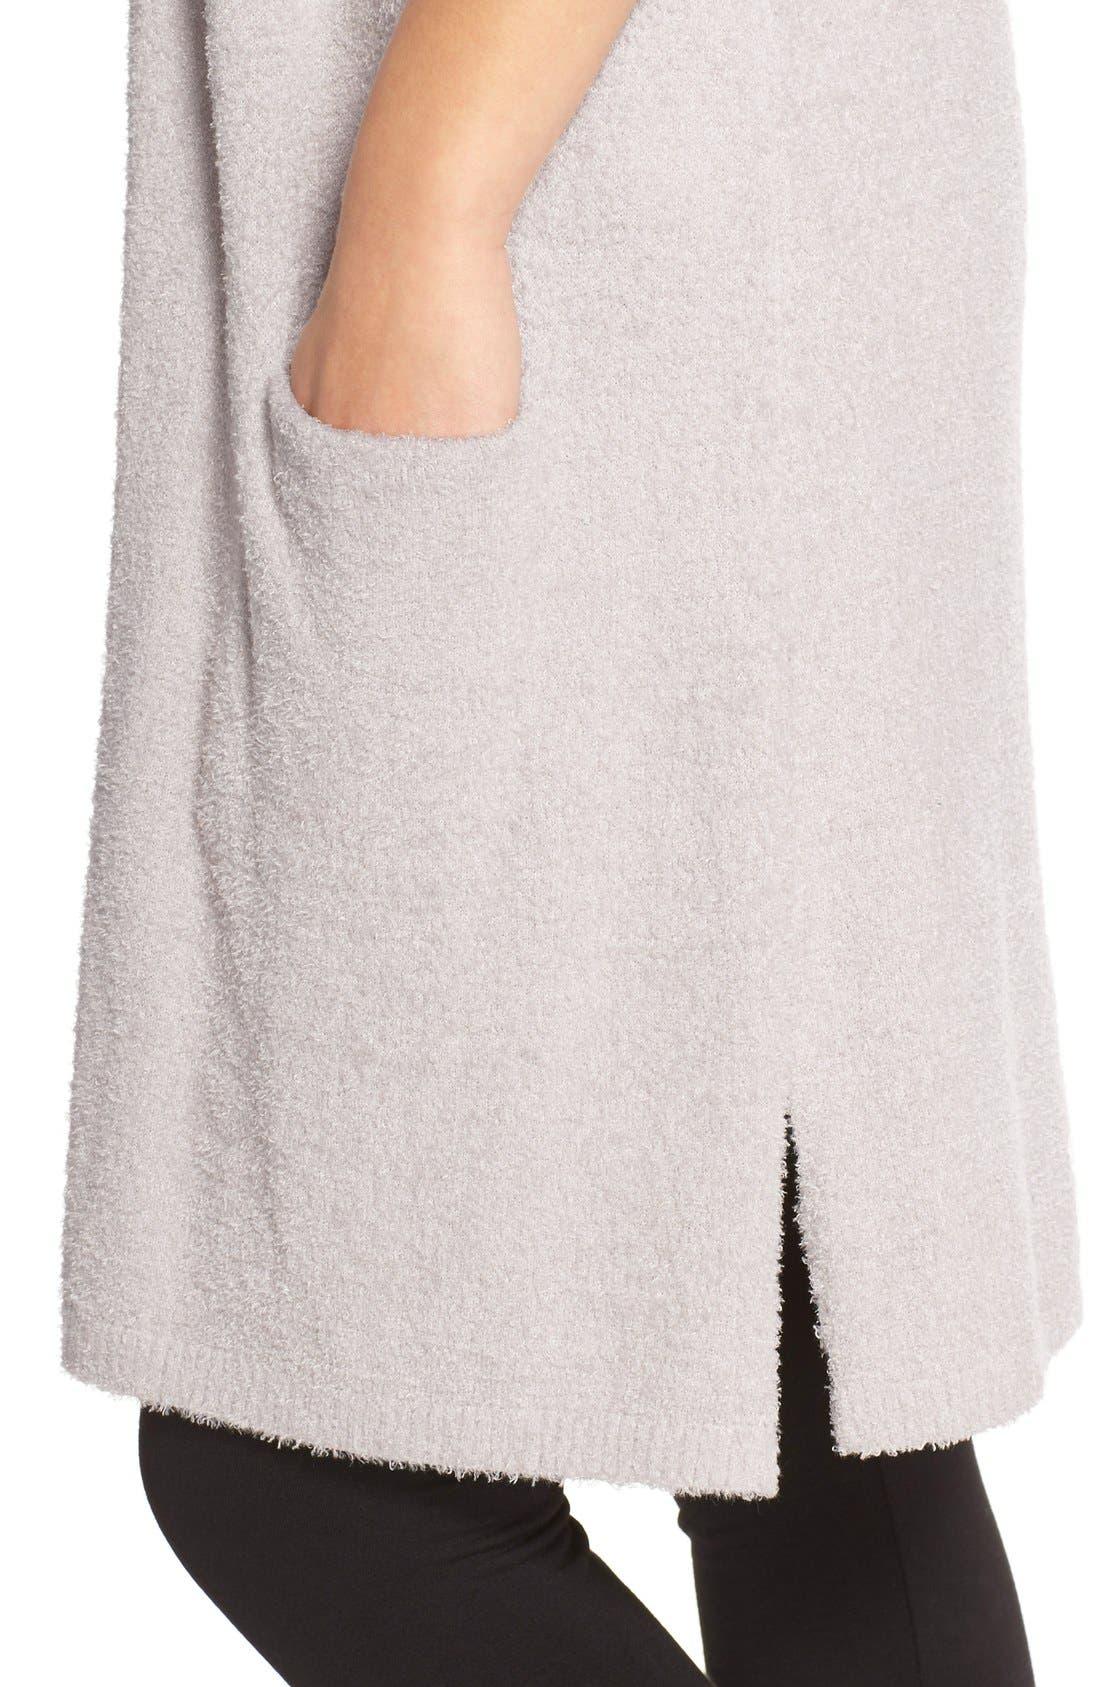 CozyChic Lite<sup>®</sup> Long Essential Cardigan,                             Alternate thumbnail 4, color,                             020